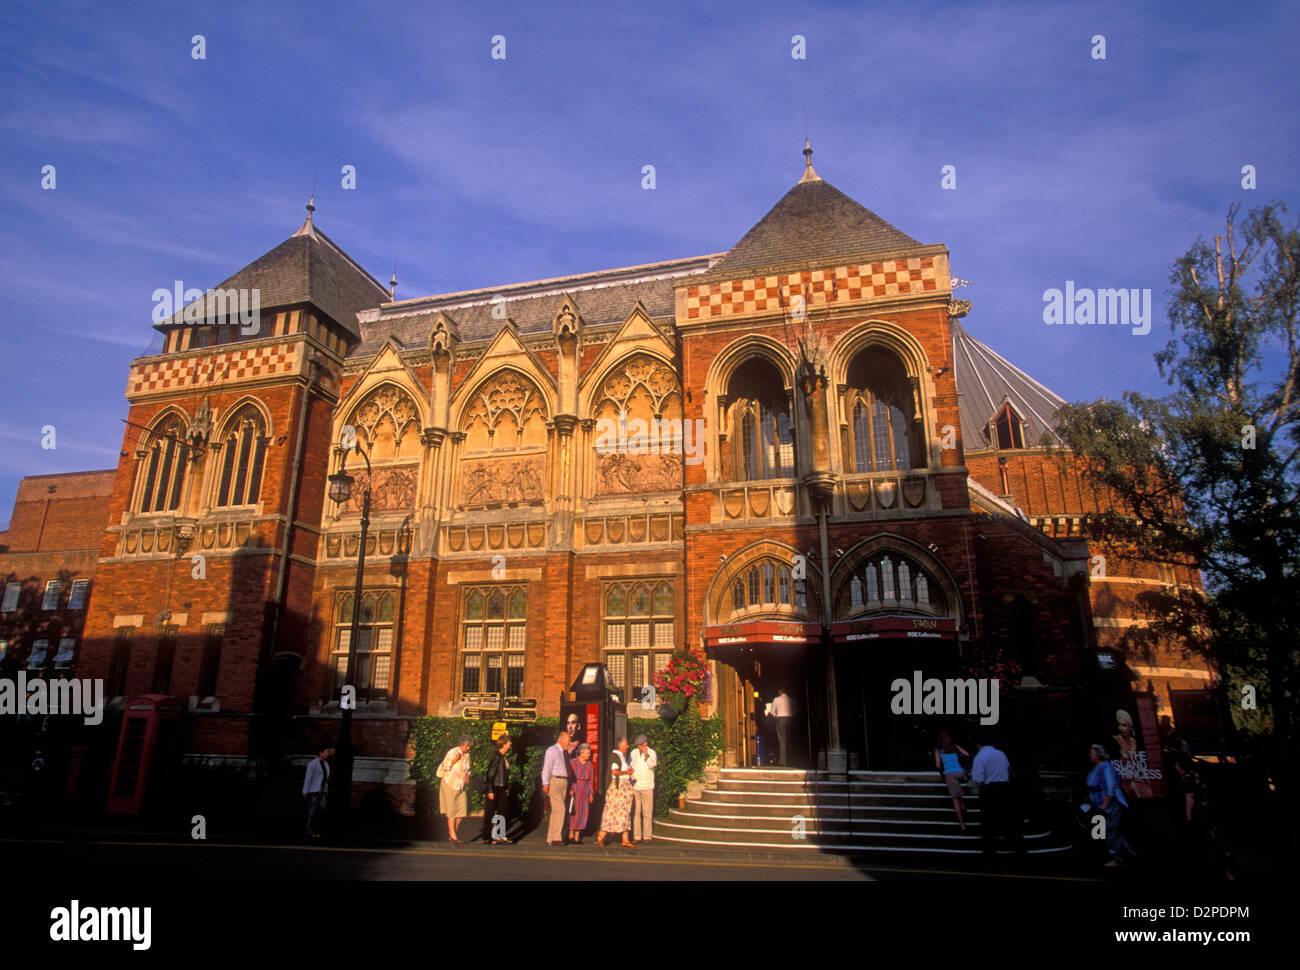 Swan Theatre, Stratford-upon-Avon, Warwickshire County, Britain, Great Britain, England, United Kingdom - Stock Image